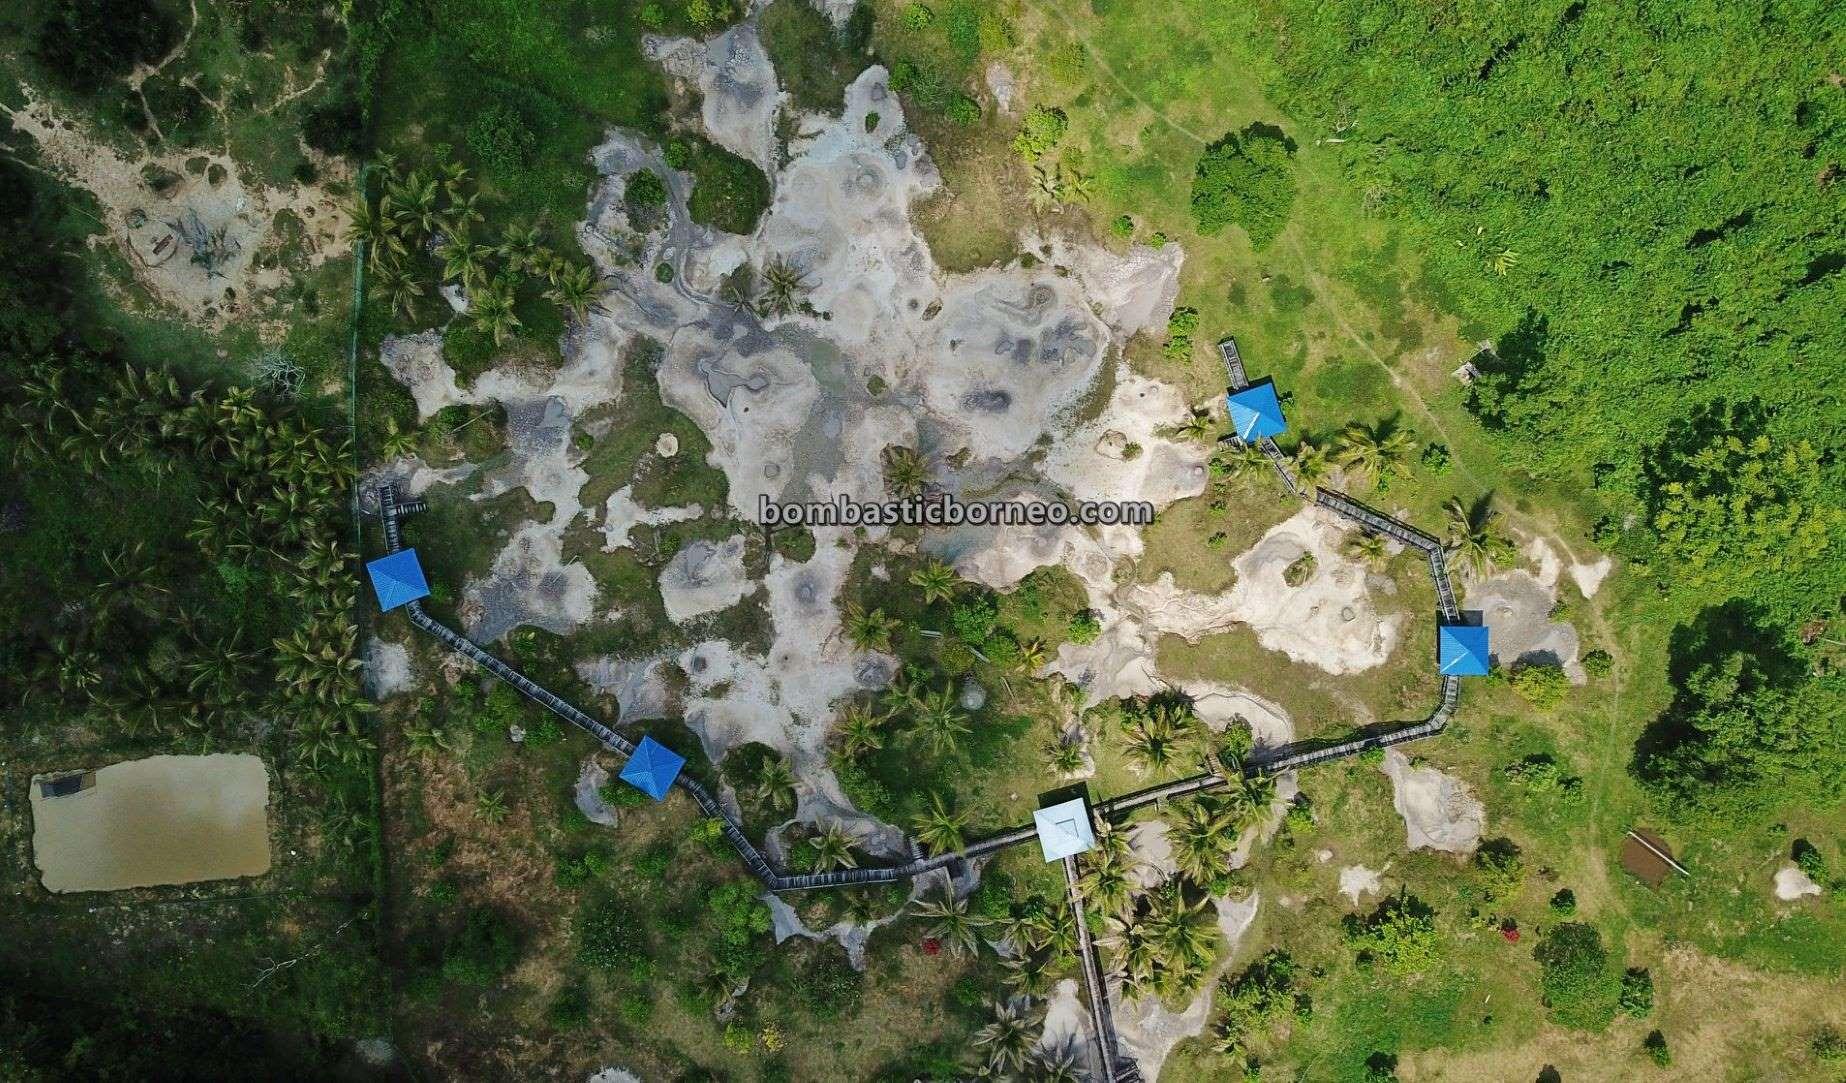 Lumpur Bebuak, Mud Volcano, Tarikan Pelancong, Kampung Meritam, Malay Village, adventure, nature, outdoor, destination, Sarawak, Malaysia, Tourism, tourist attraction, travel guide, Trans Borneo